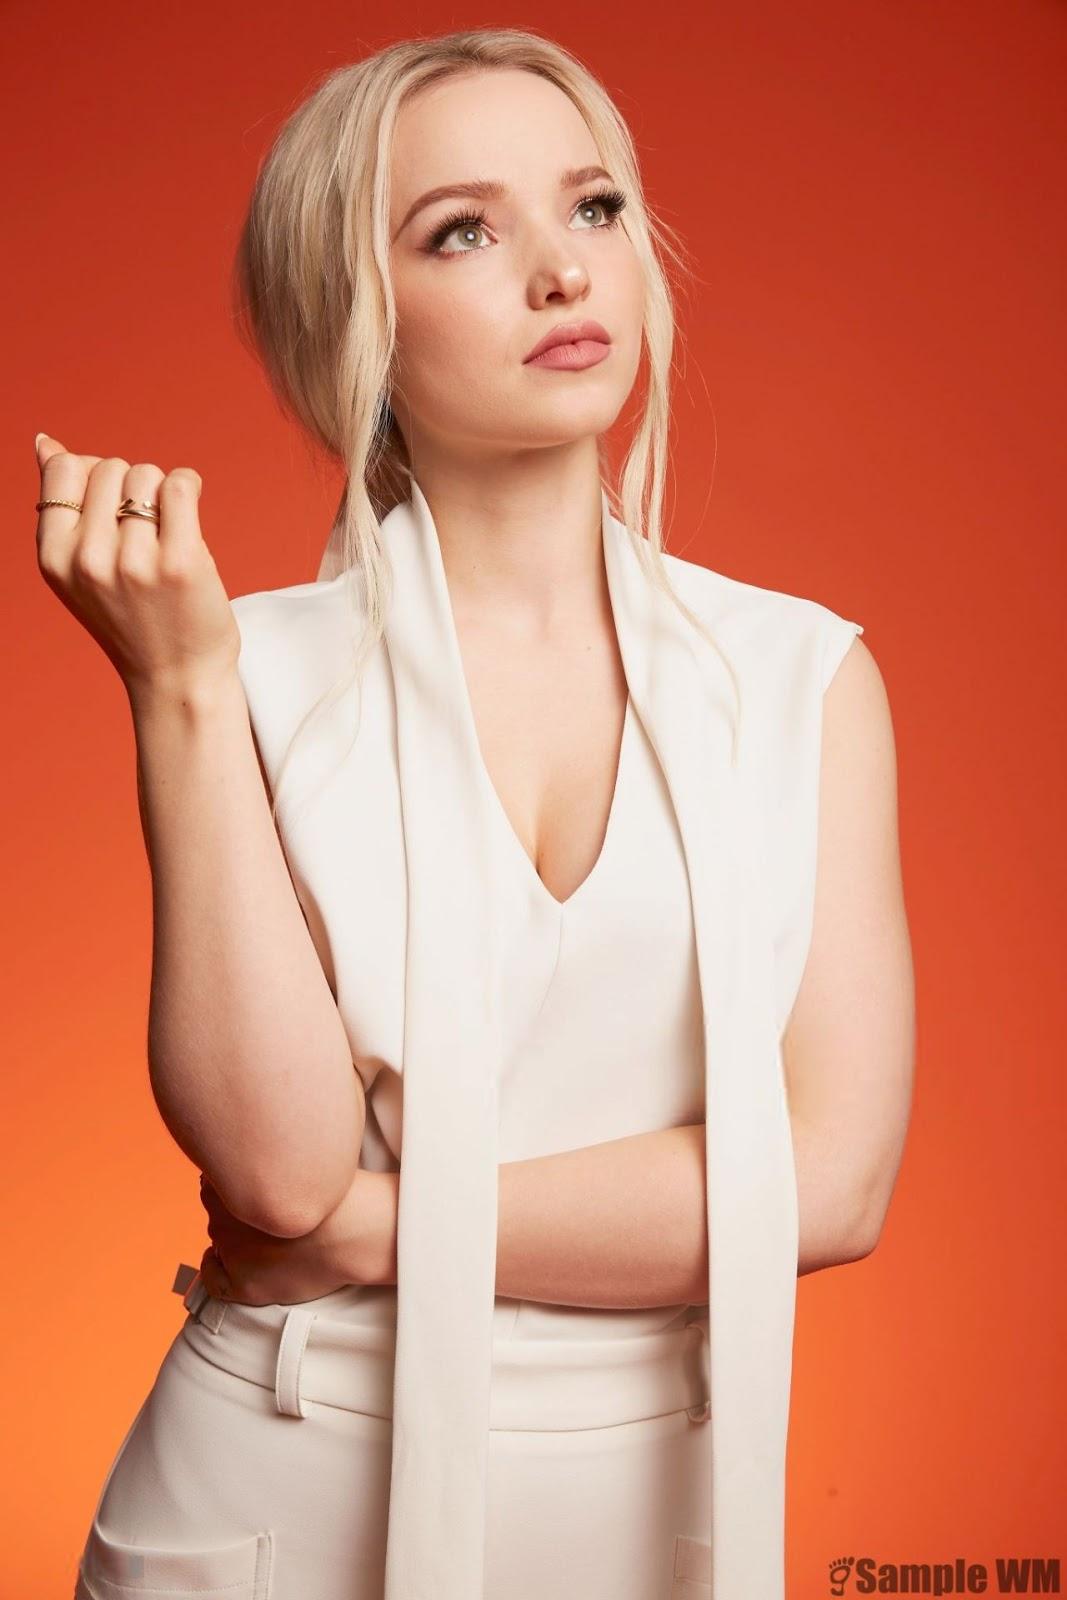 Courtney barnum braless Porn photos Jennifer Lawrence Naked - New Photo,Elsa Hosk See thru Shirt. 2018-2019 celebrityes photos leaks!